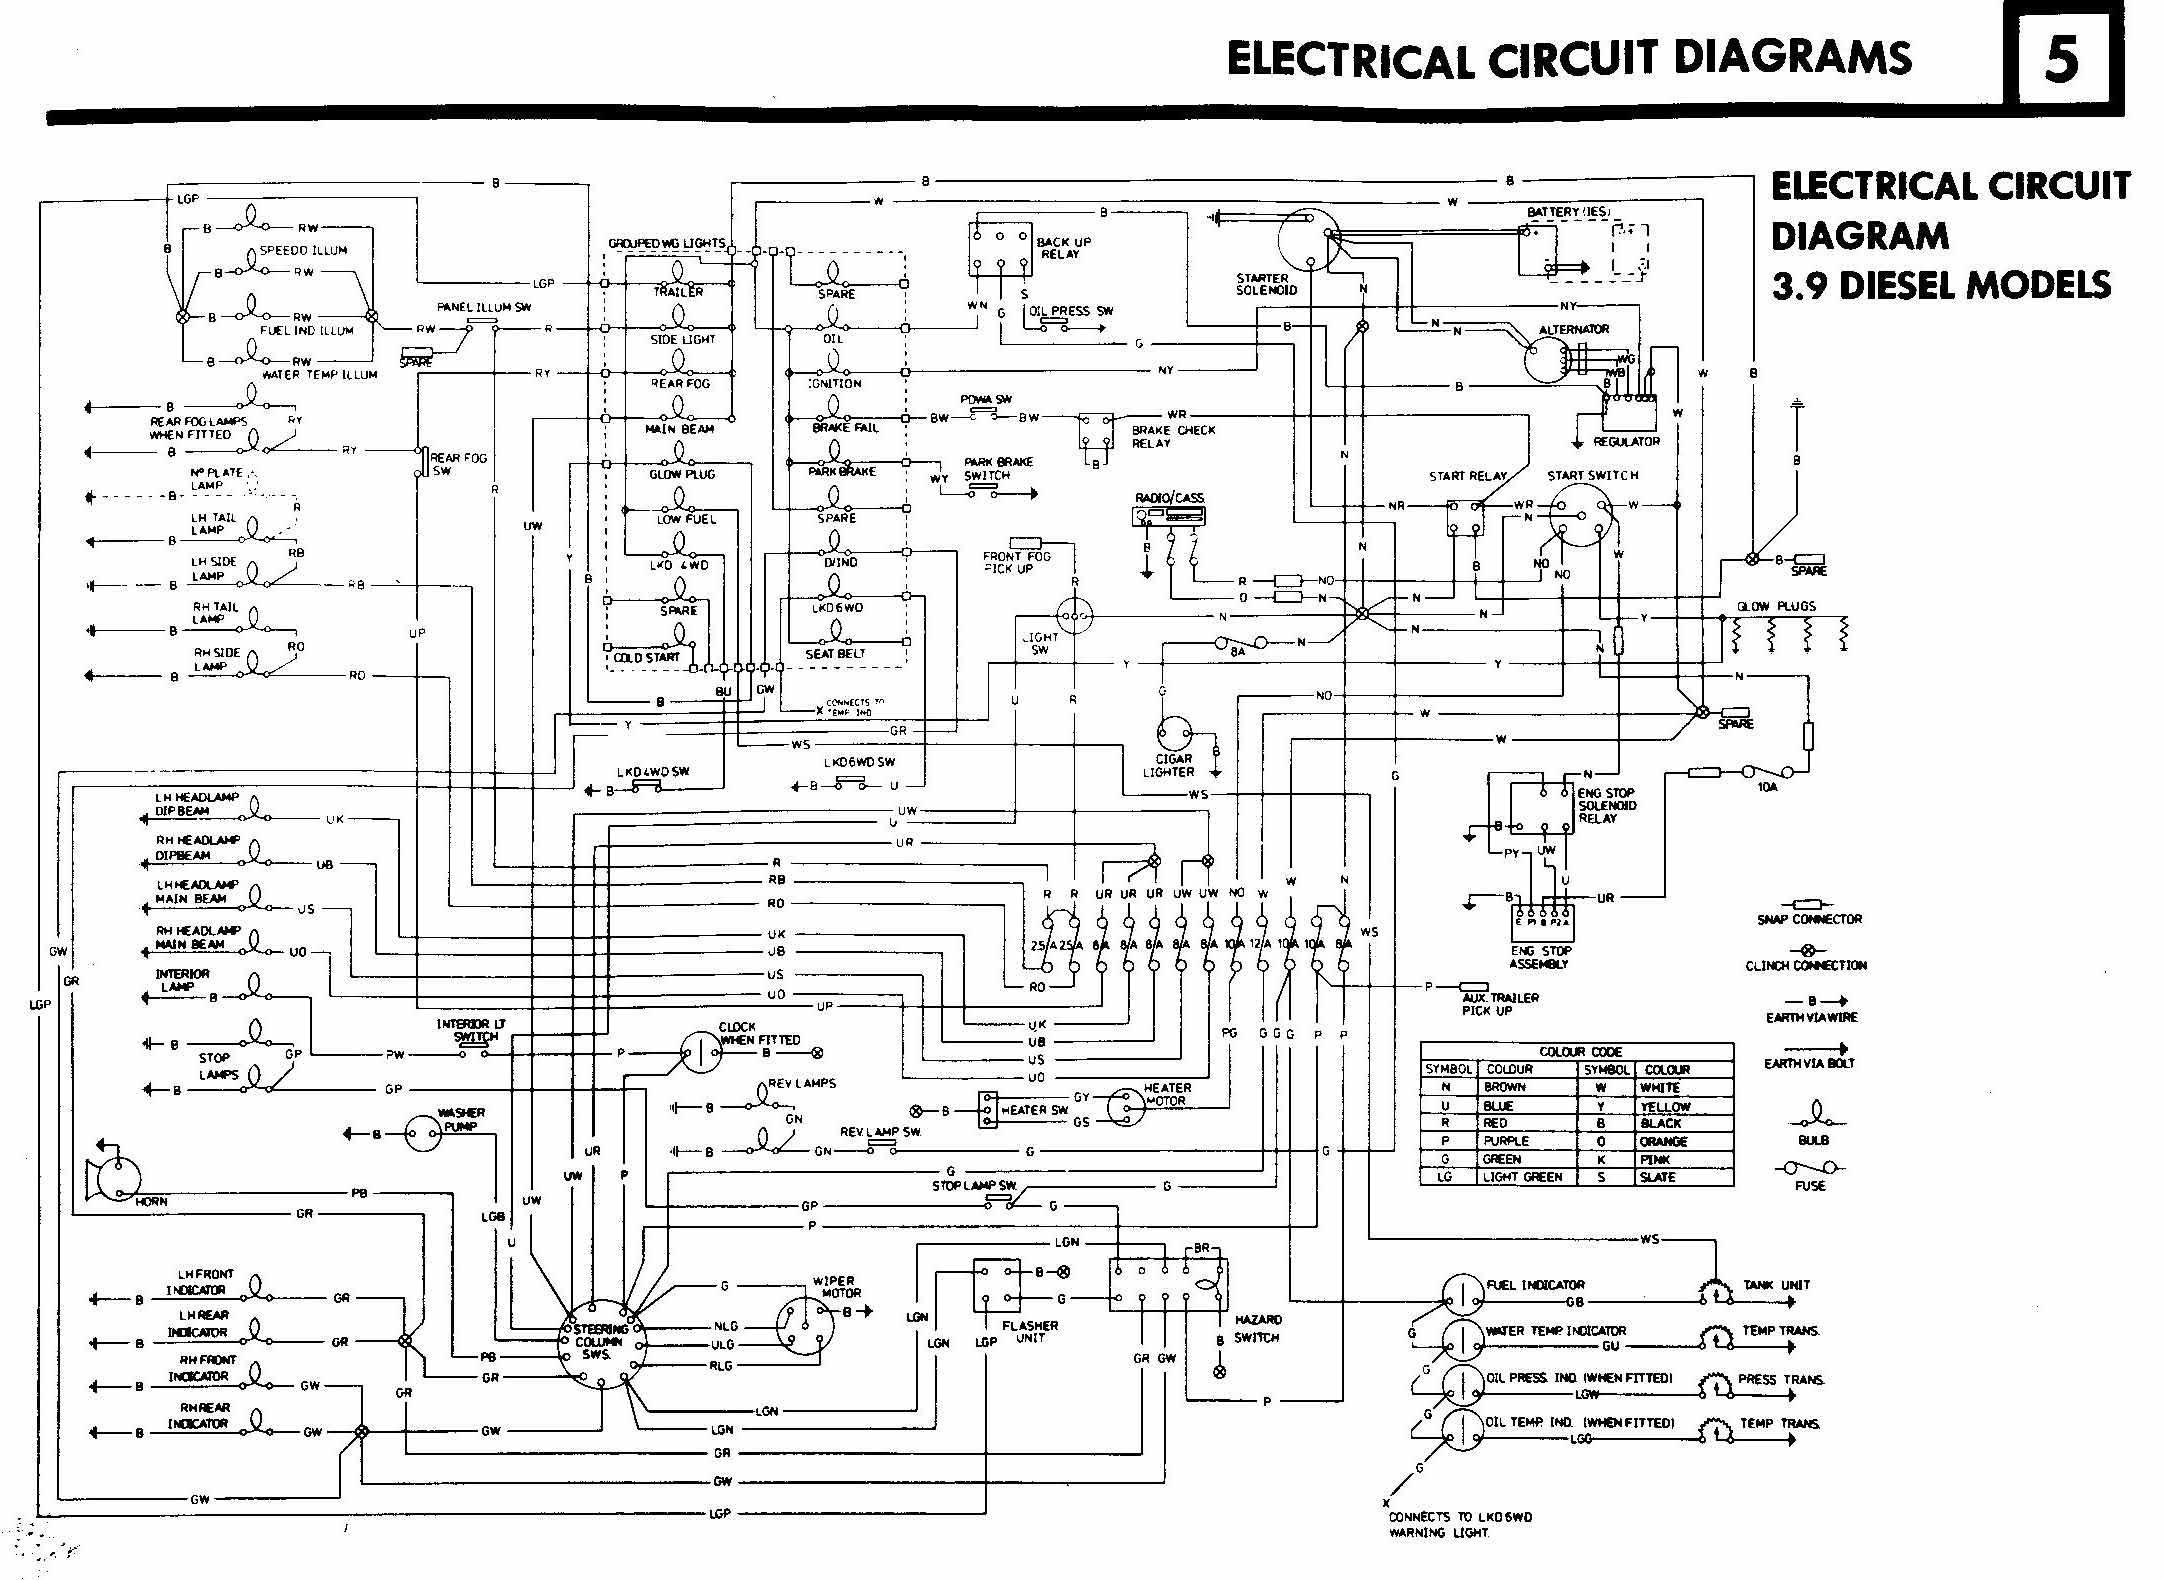 [DIAGRAM] Bmw F30 Lci User Wiring Diagram FULL Version HD